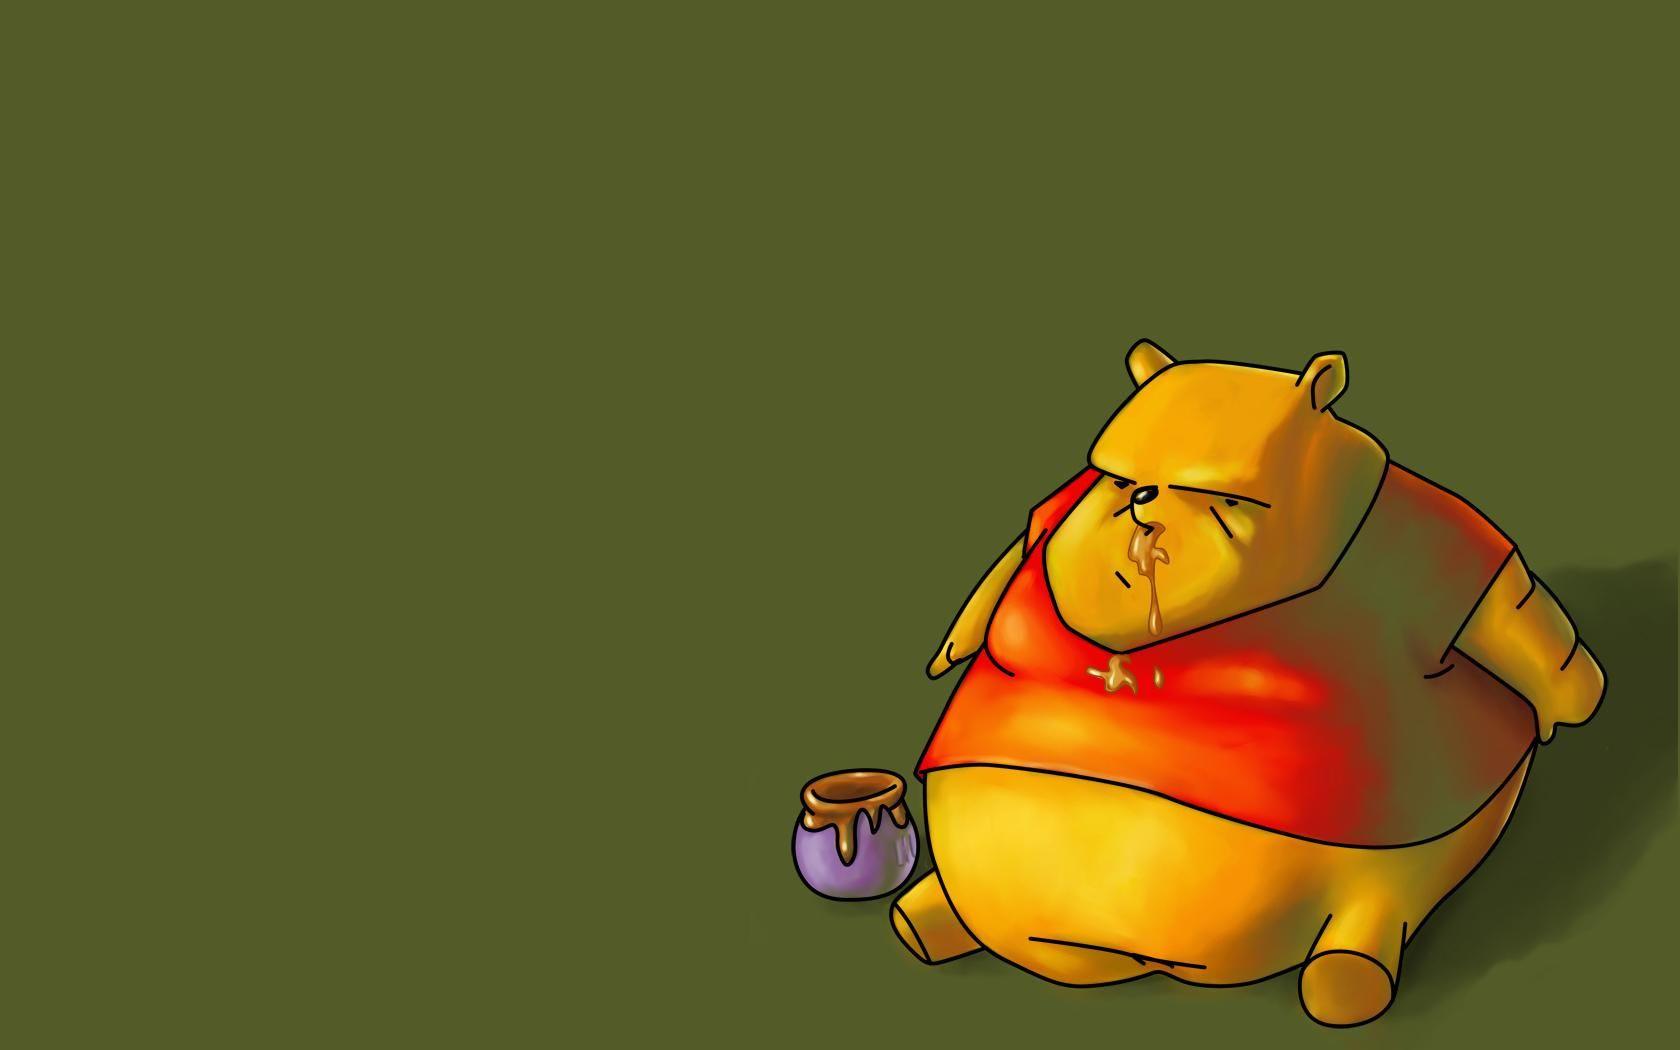 Cartoons fat funny honey parody vinnie the pooh winnie the pooh cartoons fat funny honey parody vinnie the pooh winnie the pooh wallpaper 4375 voltagebd Gallery